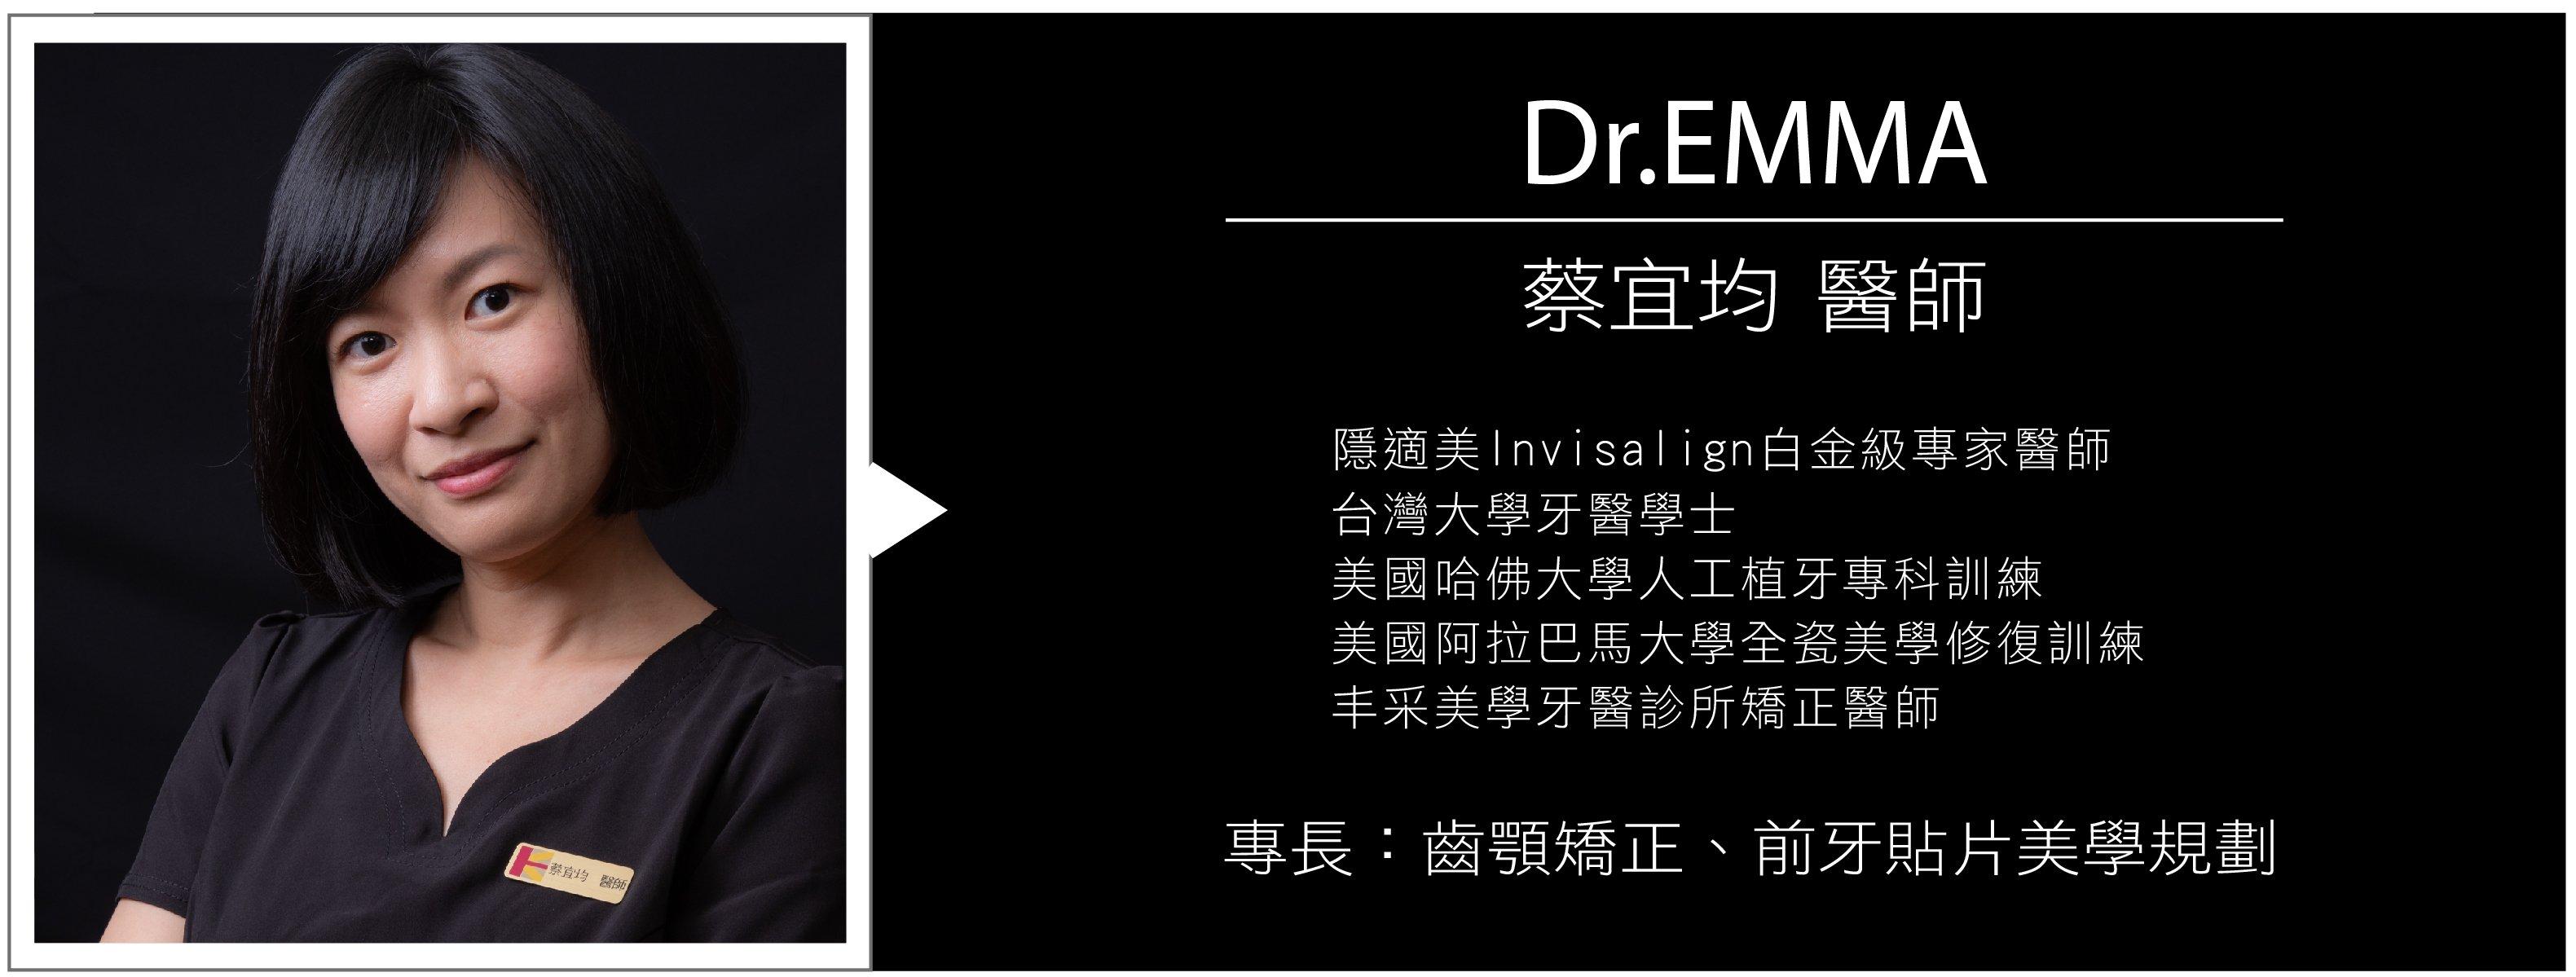 Dr.Emma蔡宜均醫師個人介紹與FB粉絲頁